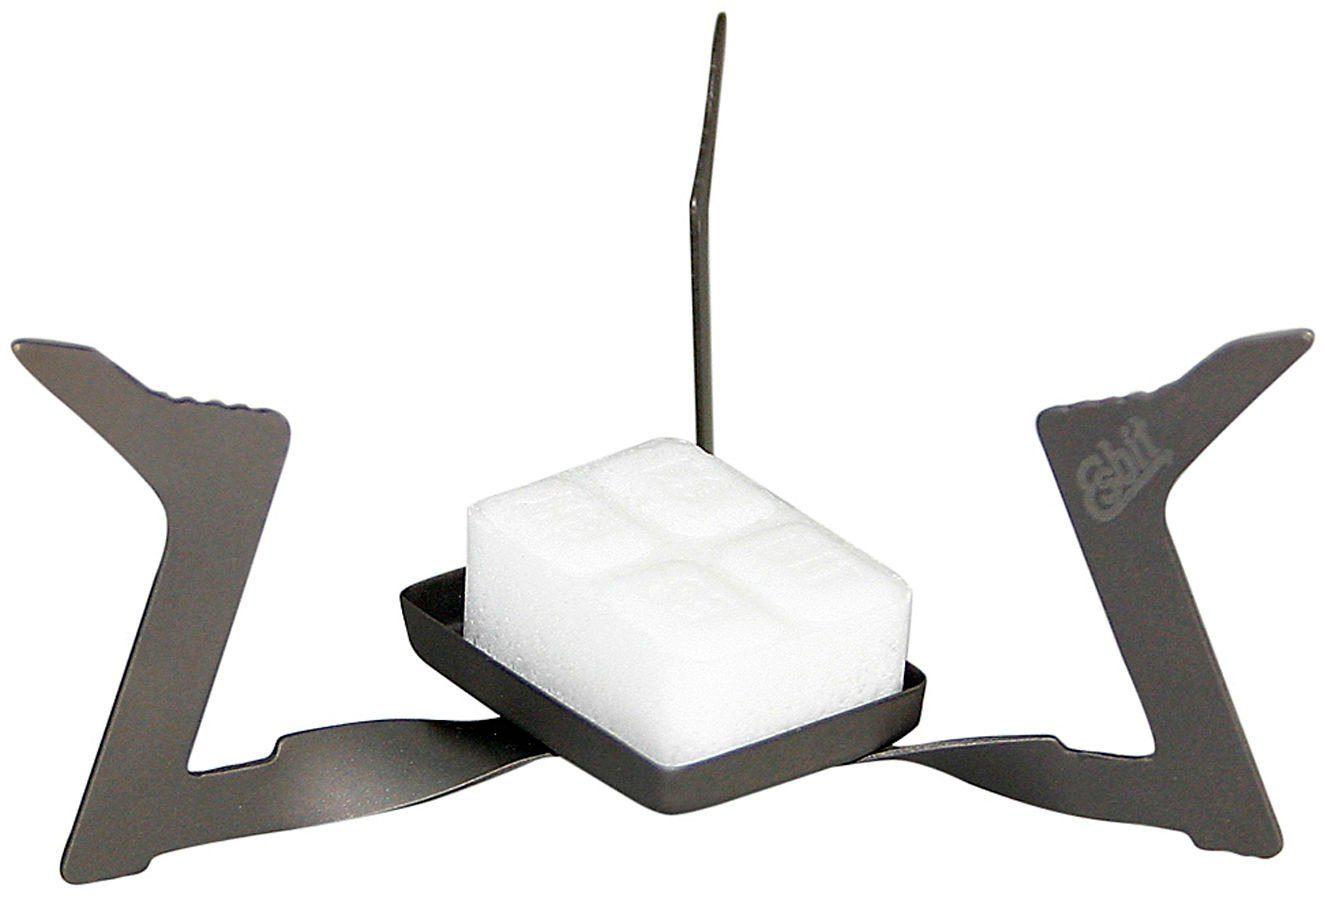 Esbit Camping-Kocher »Titan Trockenbrennstoff-Kocher«